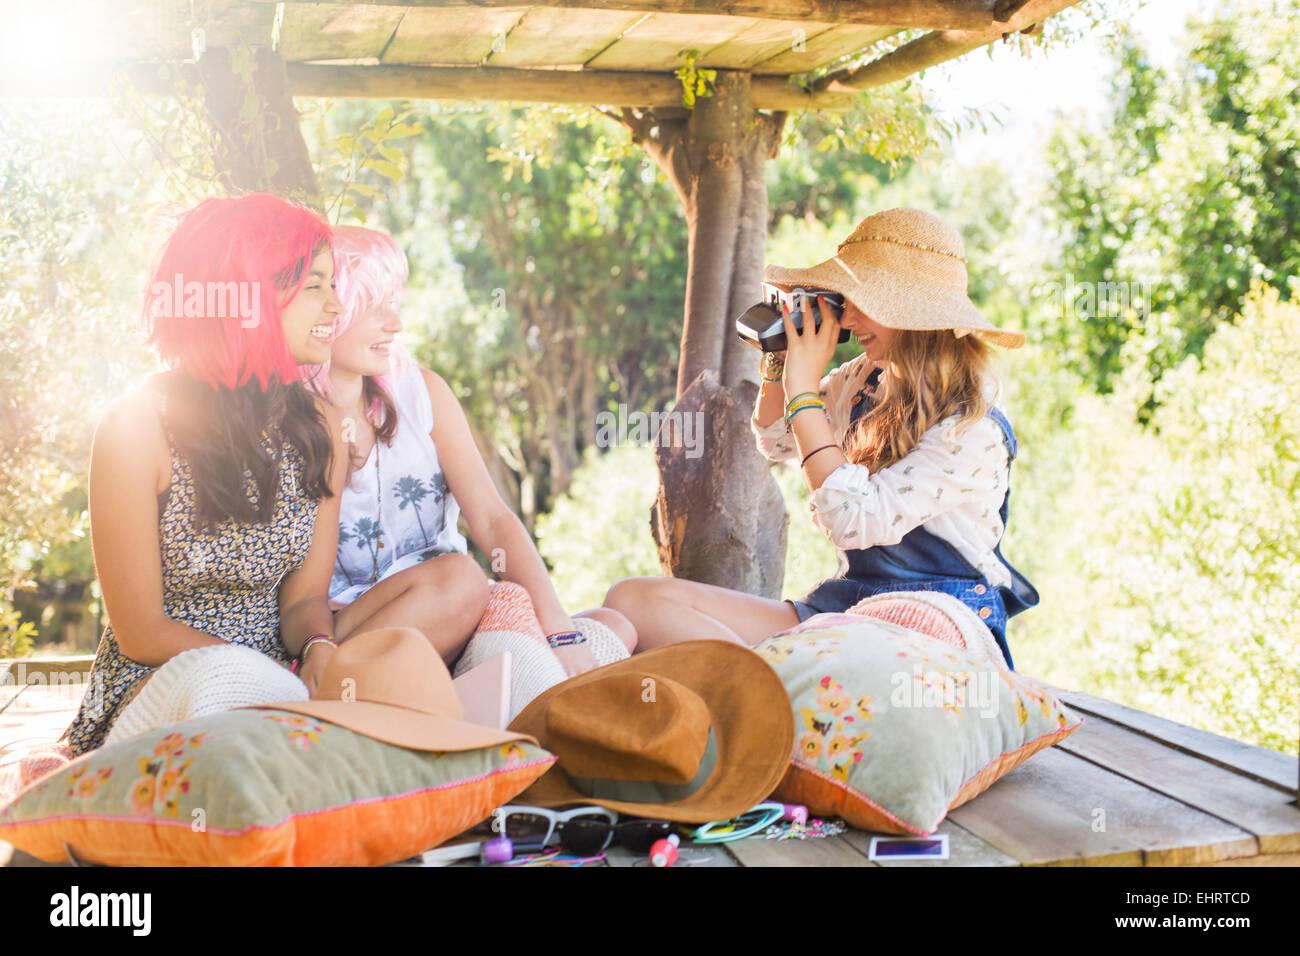 Three teenage girls taking photos in tree house in sunlight - Stock Image